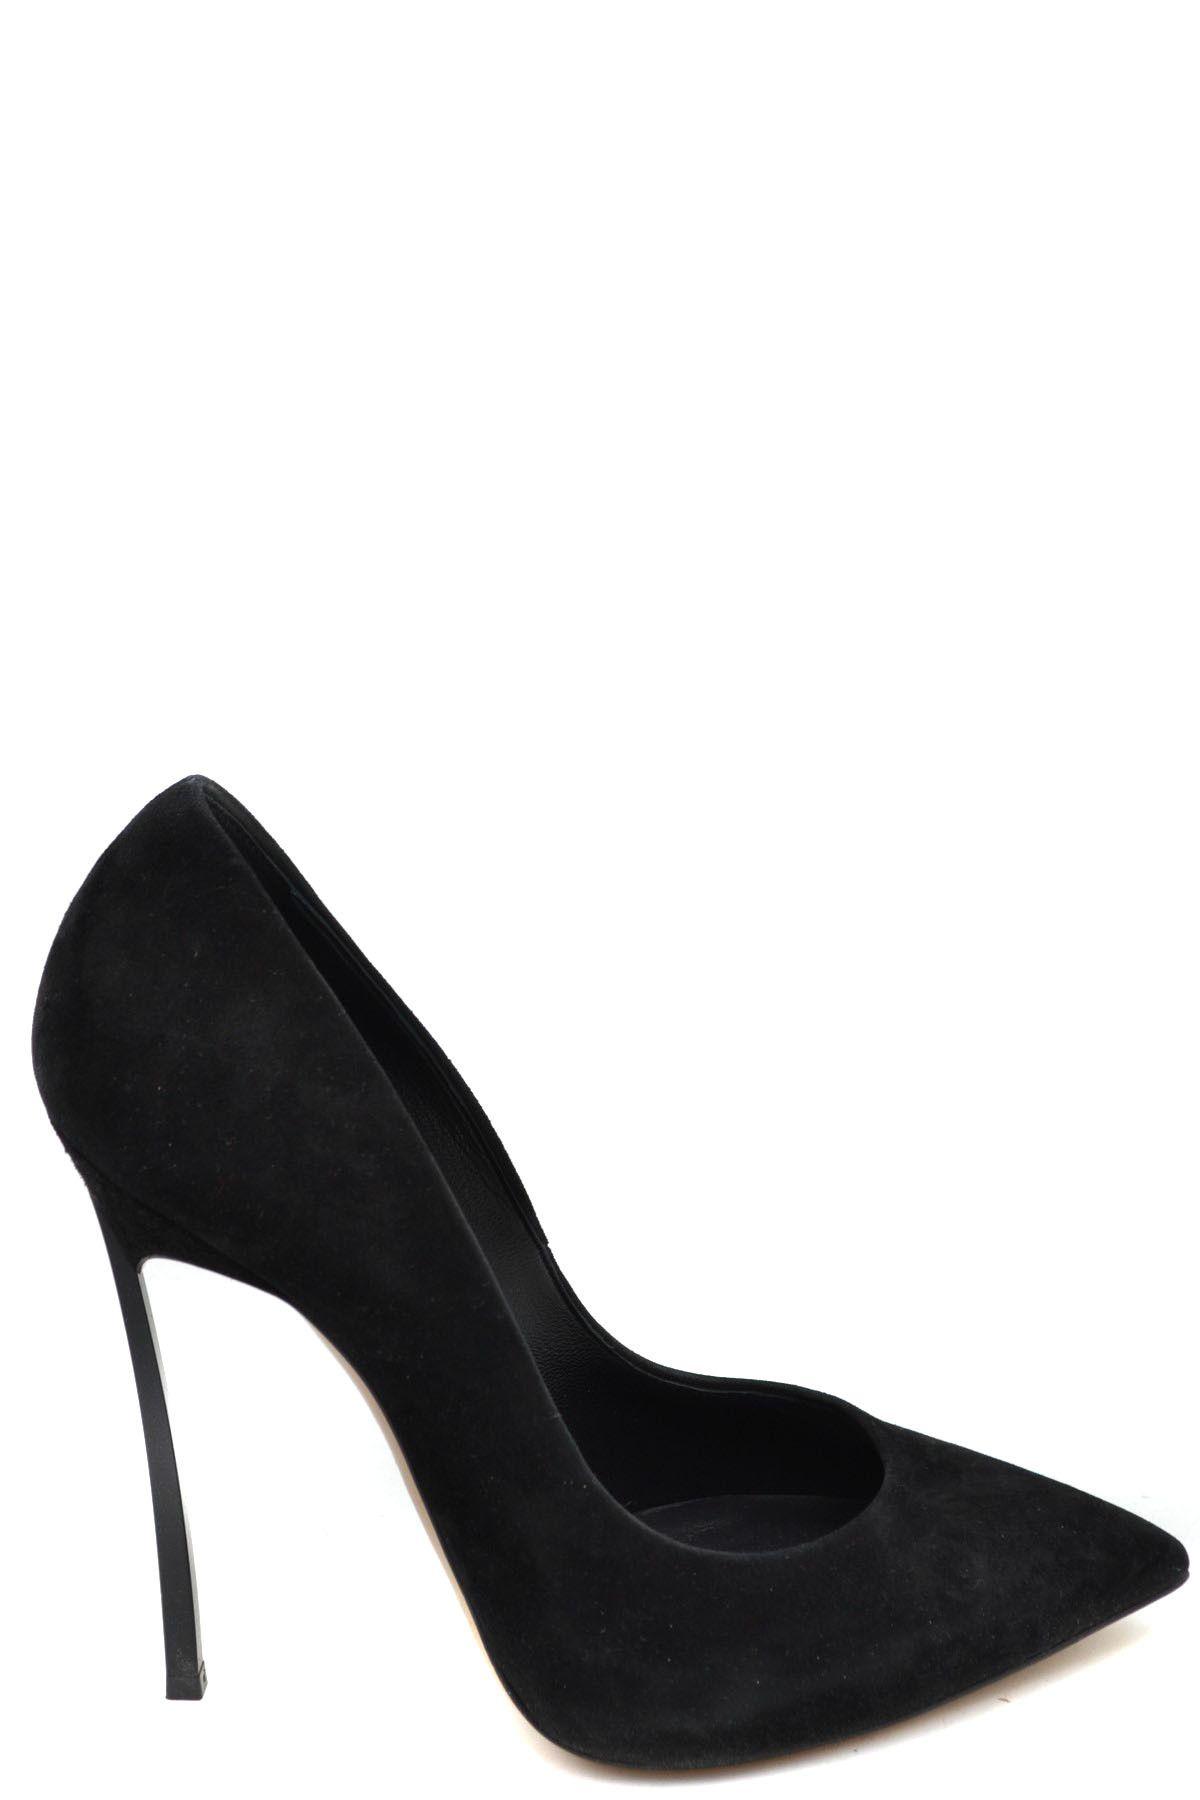 Casadei Women's Pumps Shoes In Black